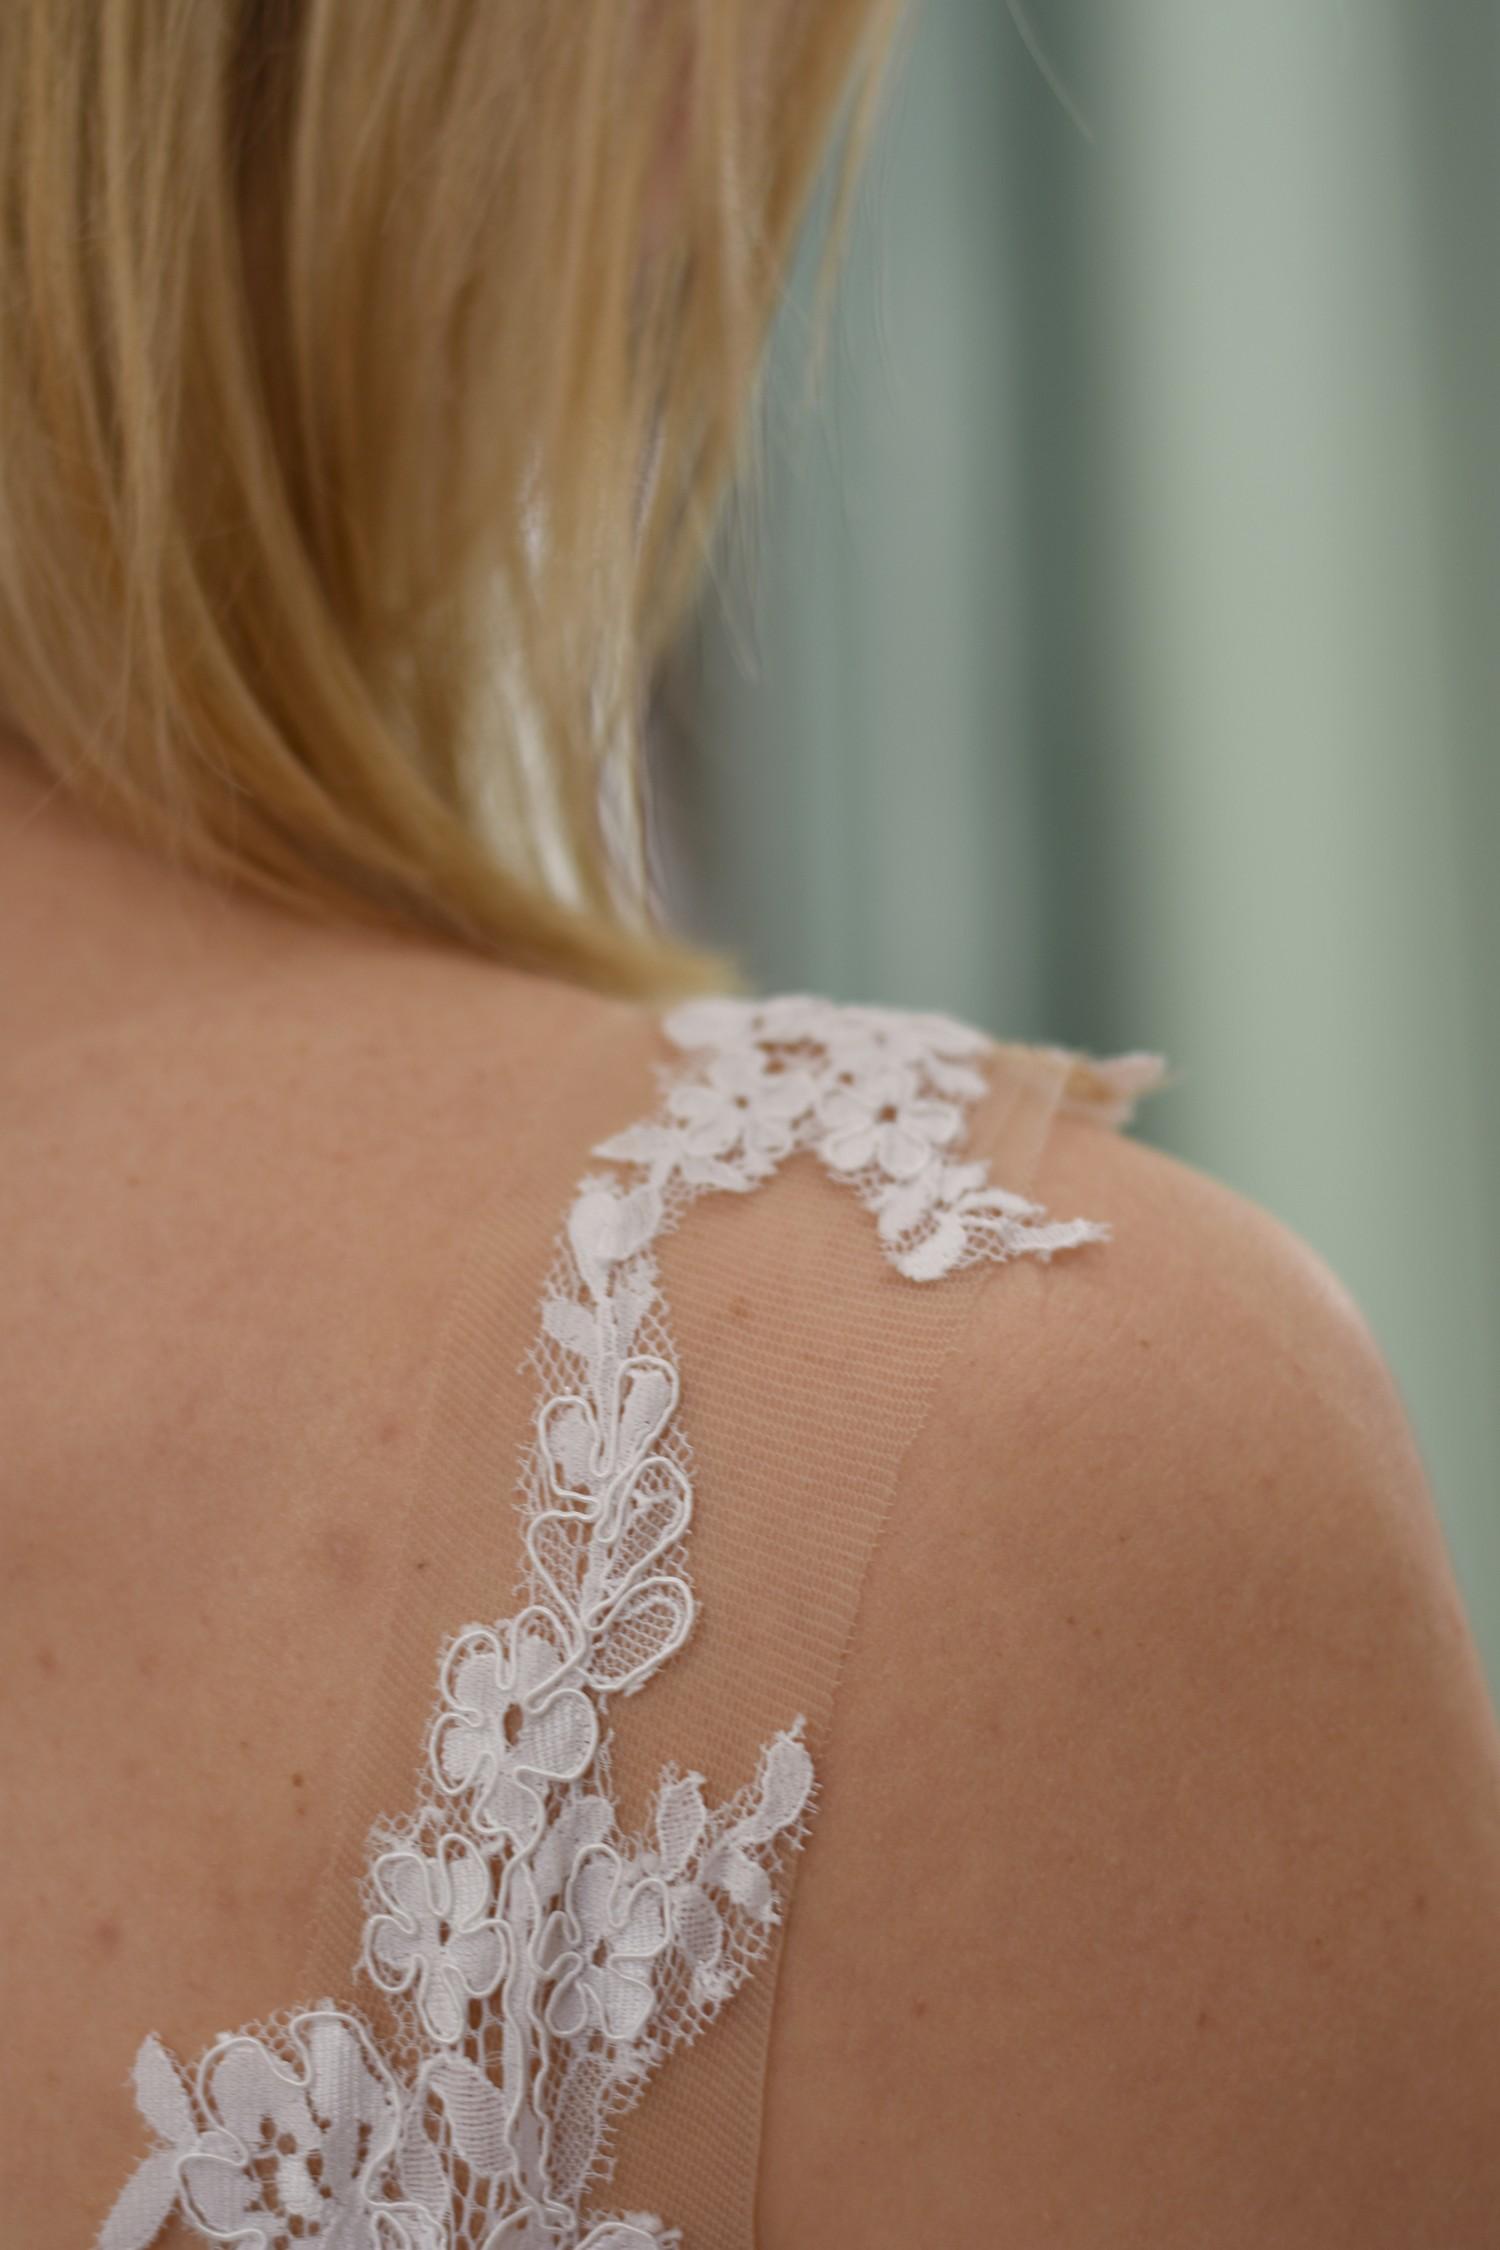 lilly-brudekjoler-annemette-voss-88